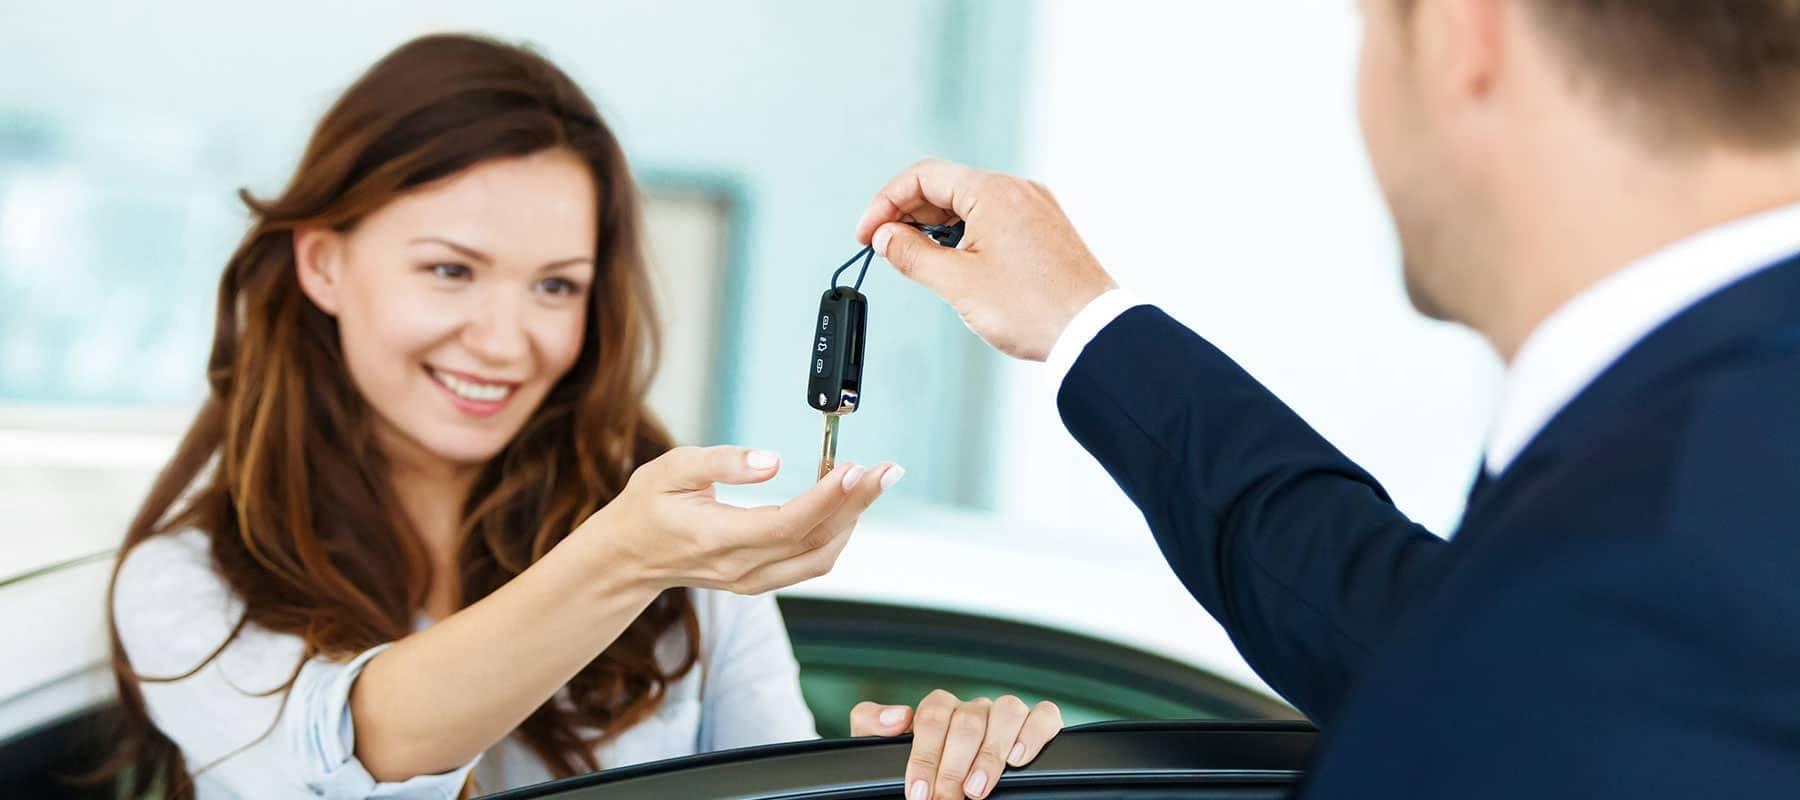 Woman being handed car keys